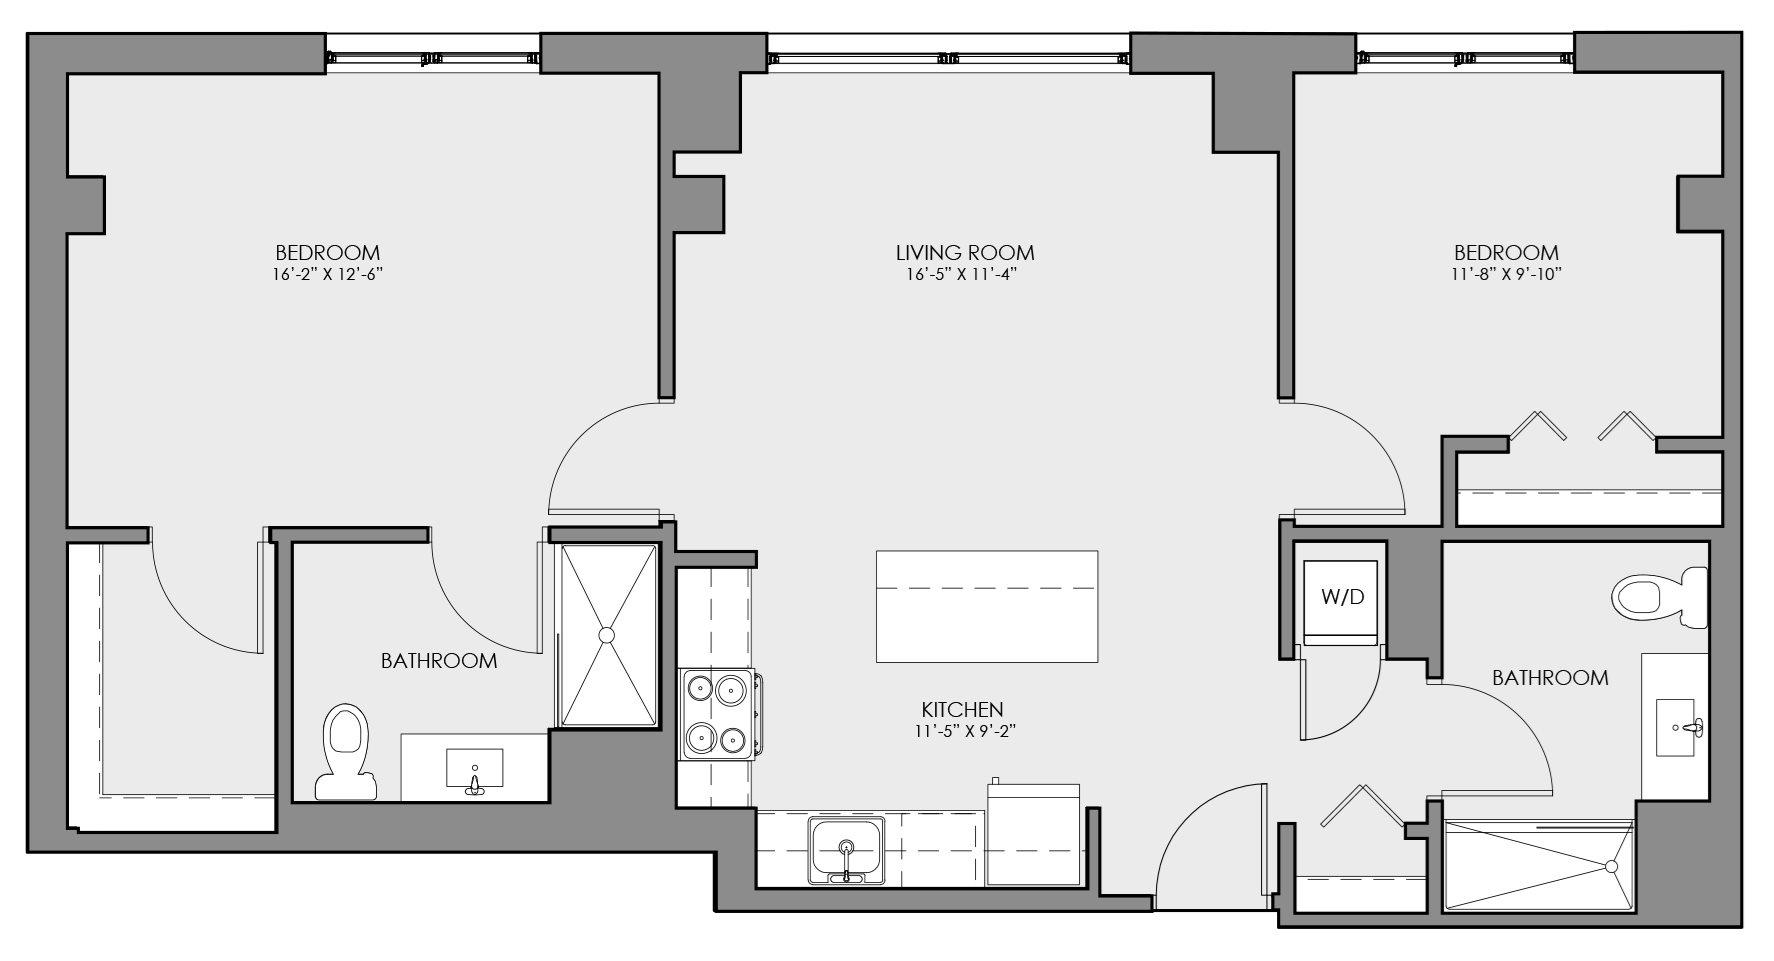 2A Floor Plan 7